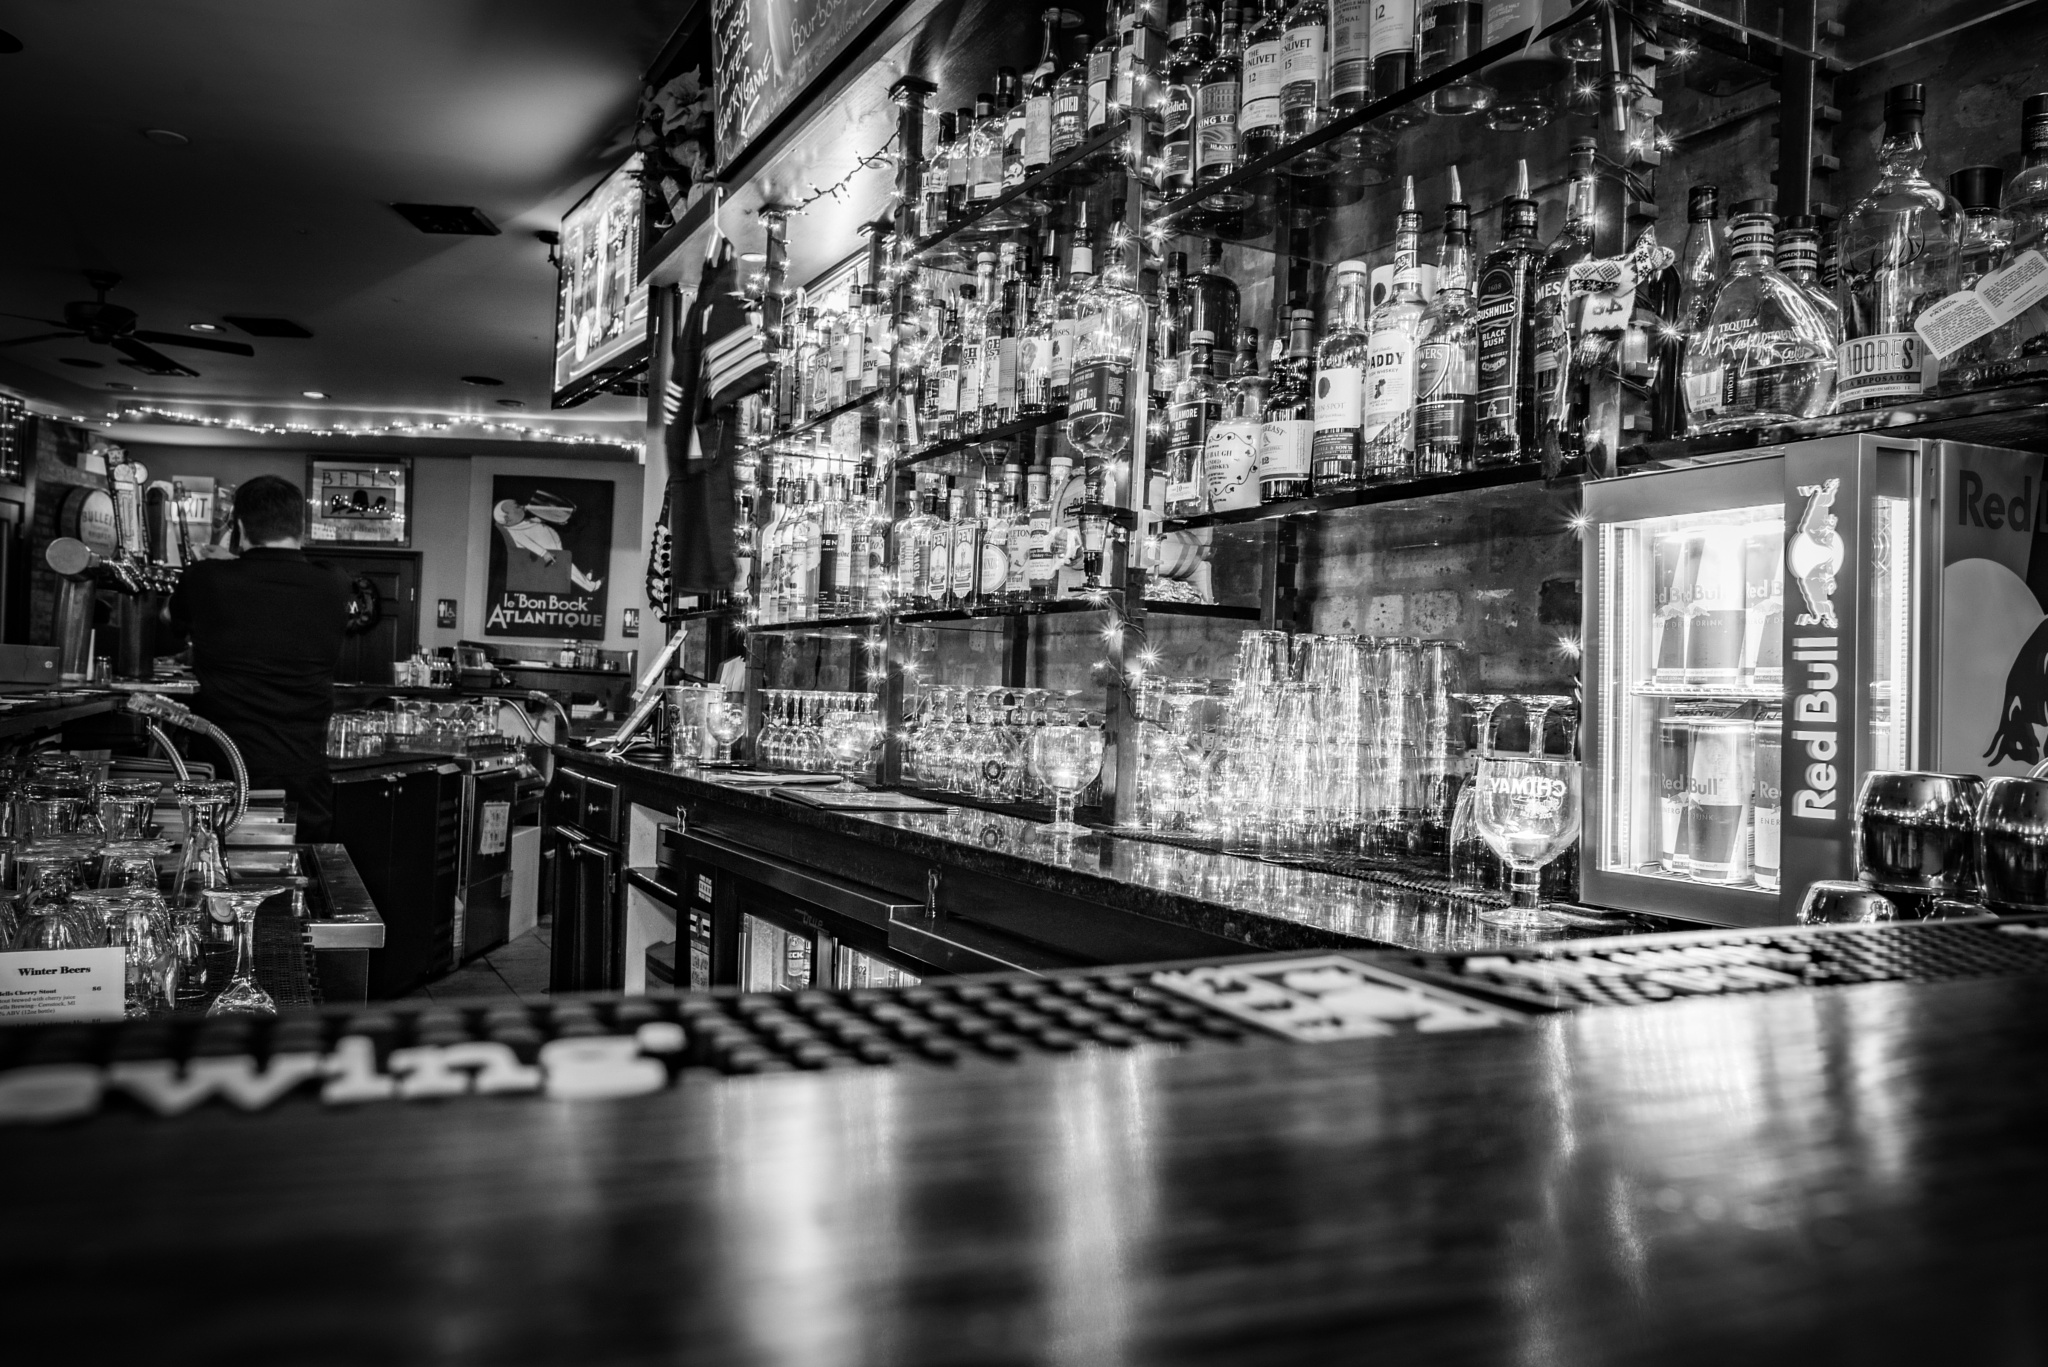 Neighborhood Bar by Kevin Drew Davis